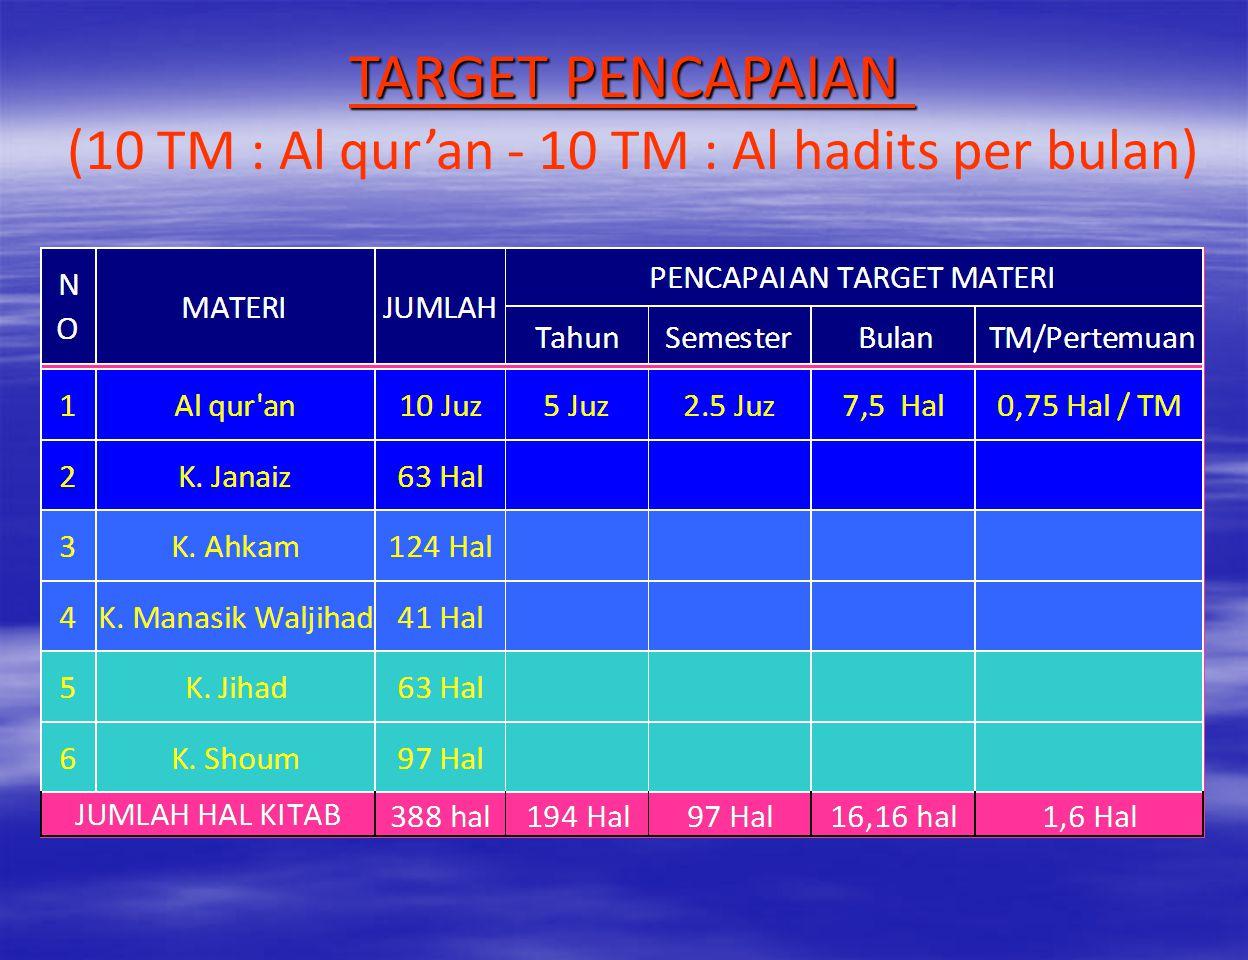 TAHUN KE-1 MATERI 1. MAKNA AL QUR'AN JUZ 11-15 2. MA'NA AL HADITS : a. K. Janaiz b. K. Ahkam c. K. Manasik Waljihad d. K. Shoum TARGET UMUR 12 - 14 TA